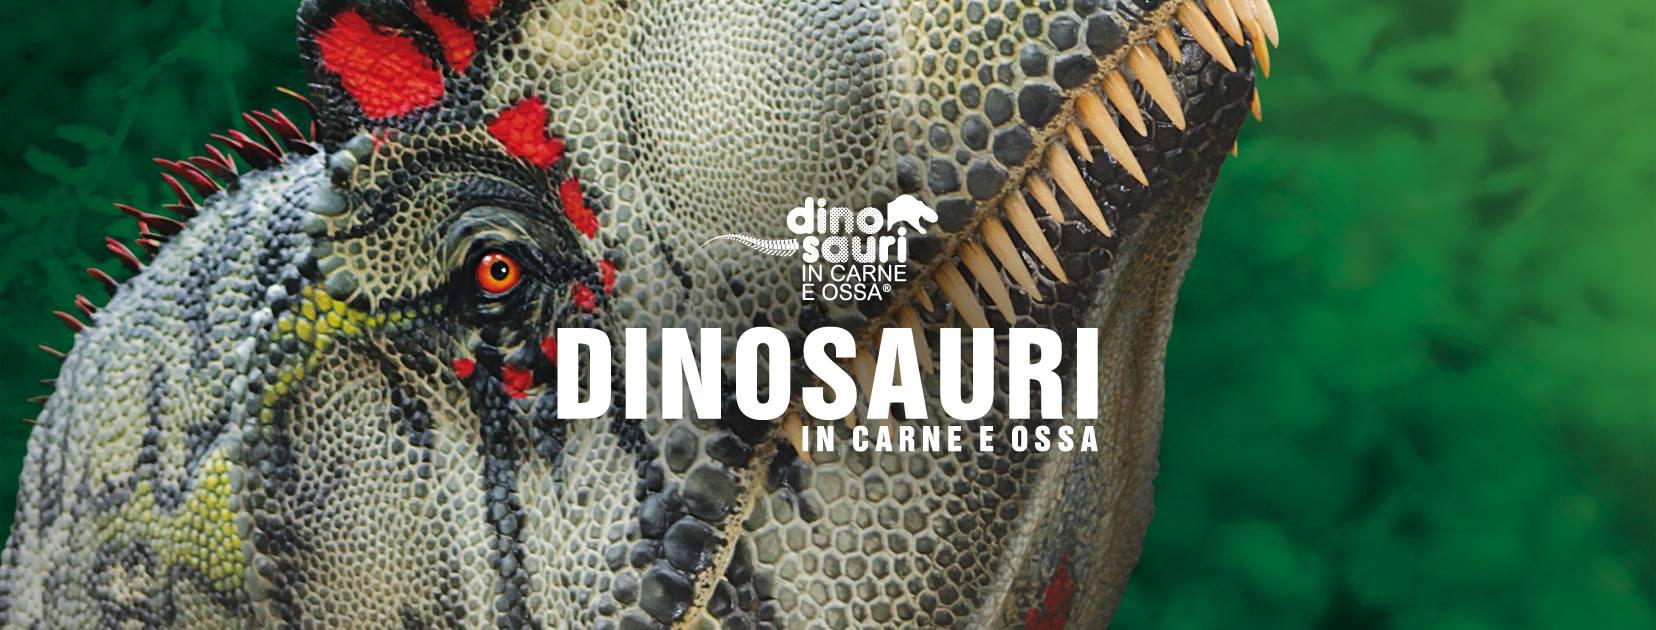 Dinosauri il Parco